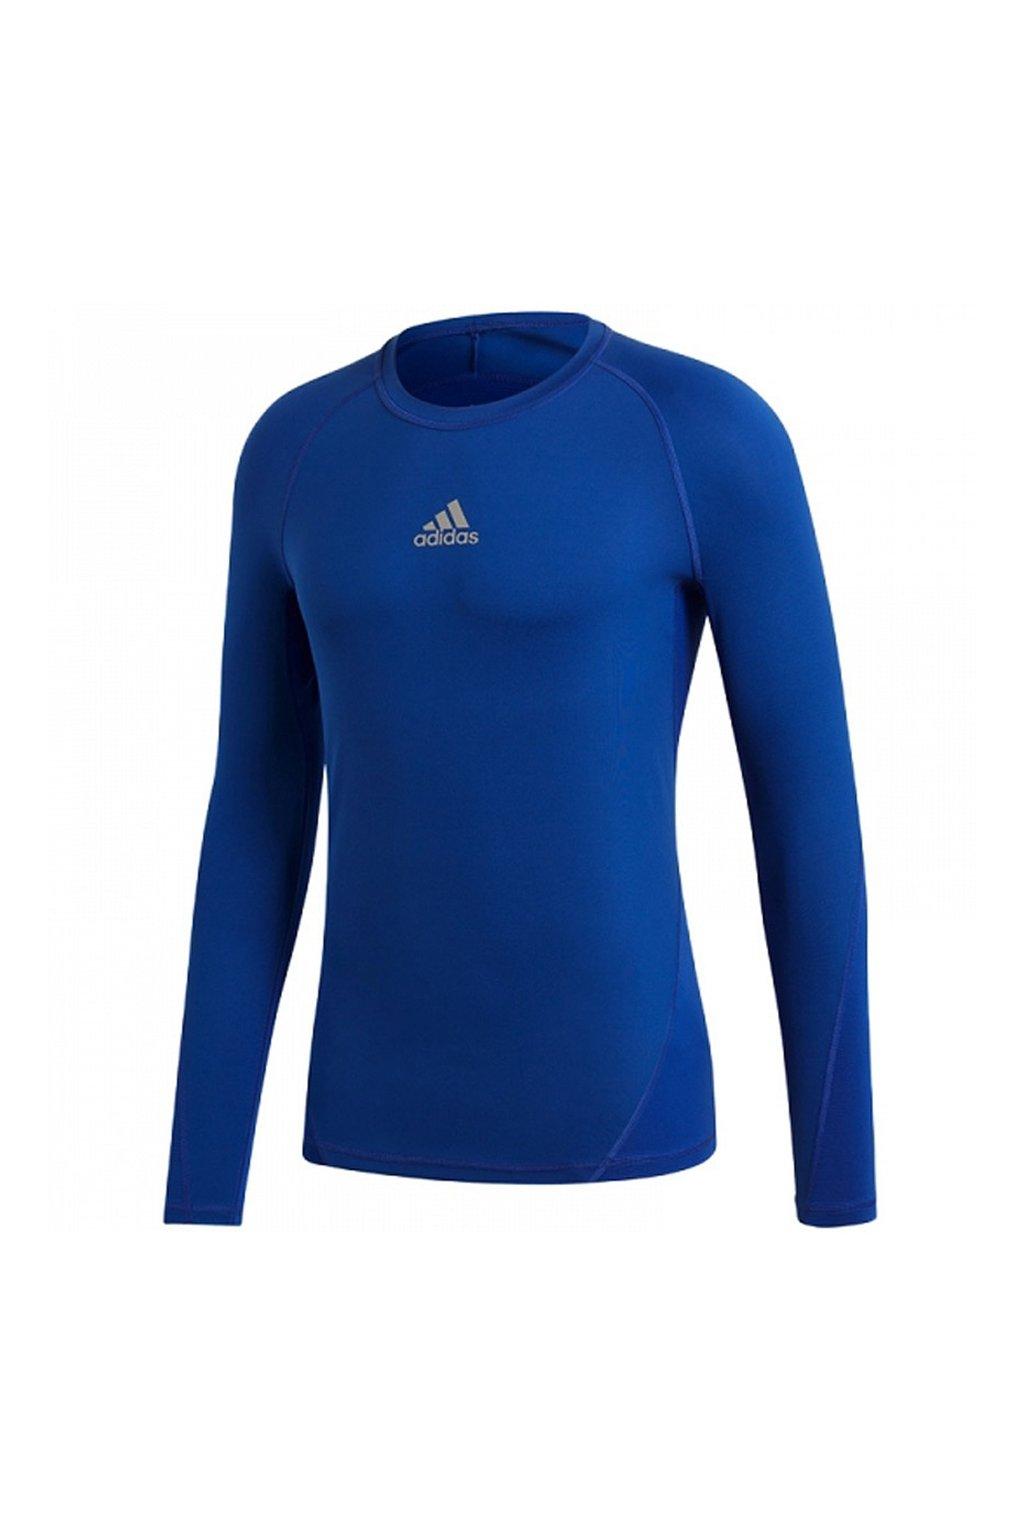 Adidas Alphaskin Sport LS Tee JUNIOR modrá CW7323